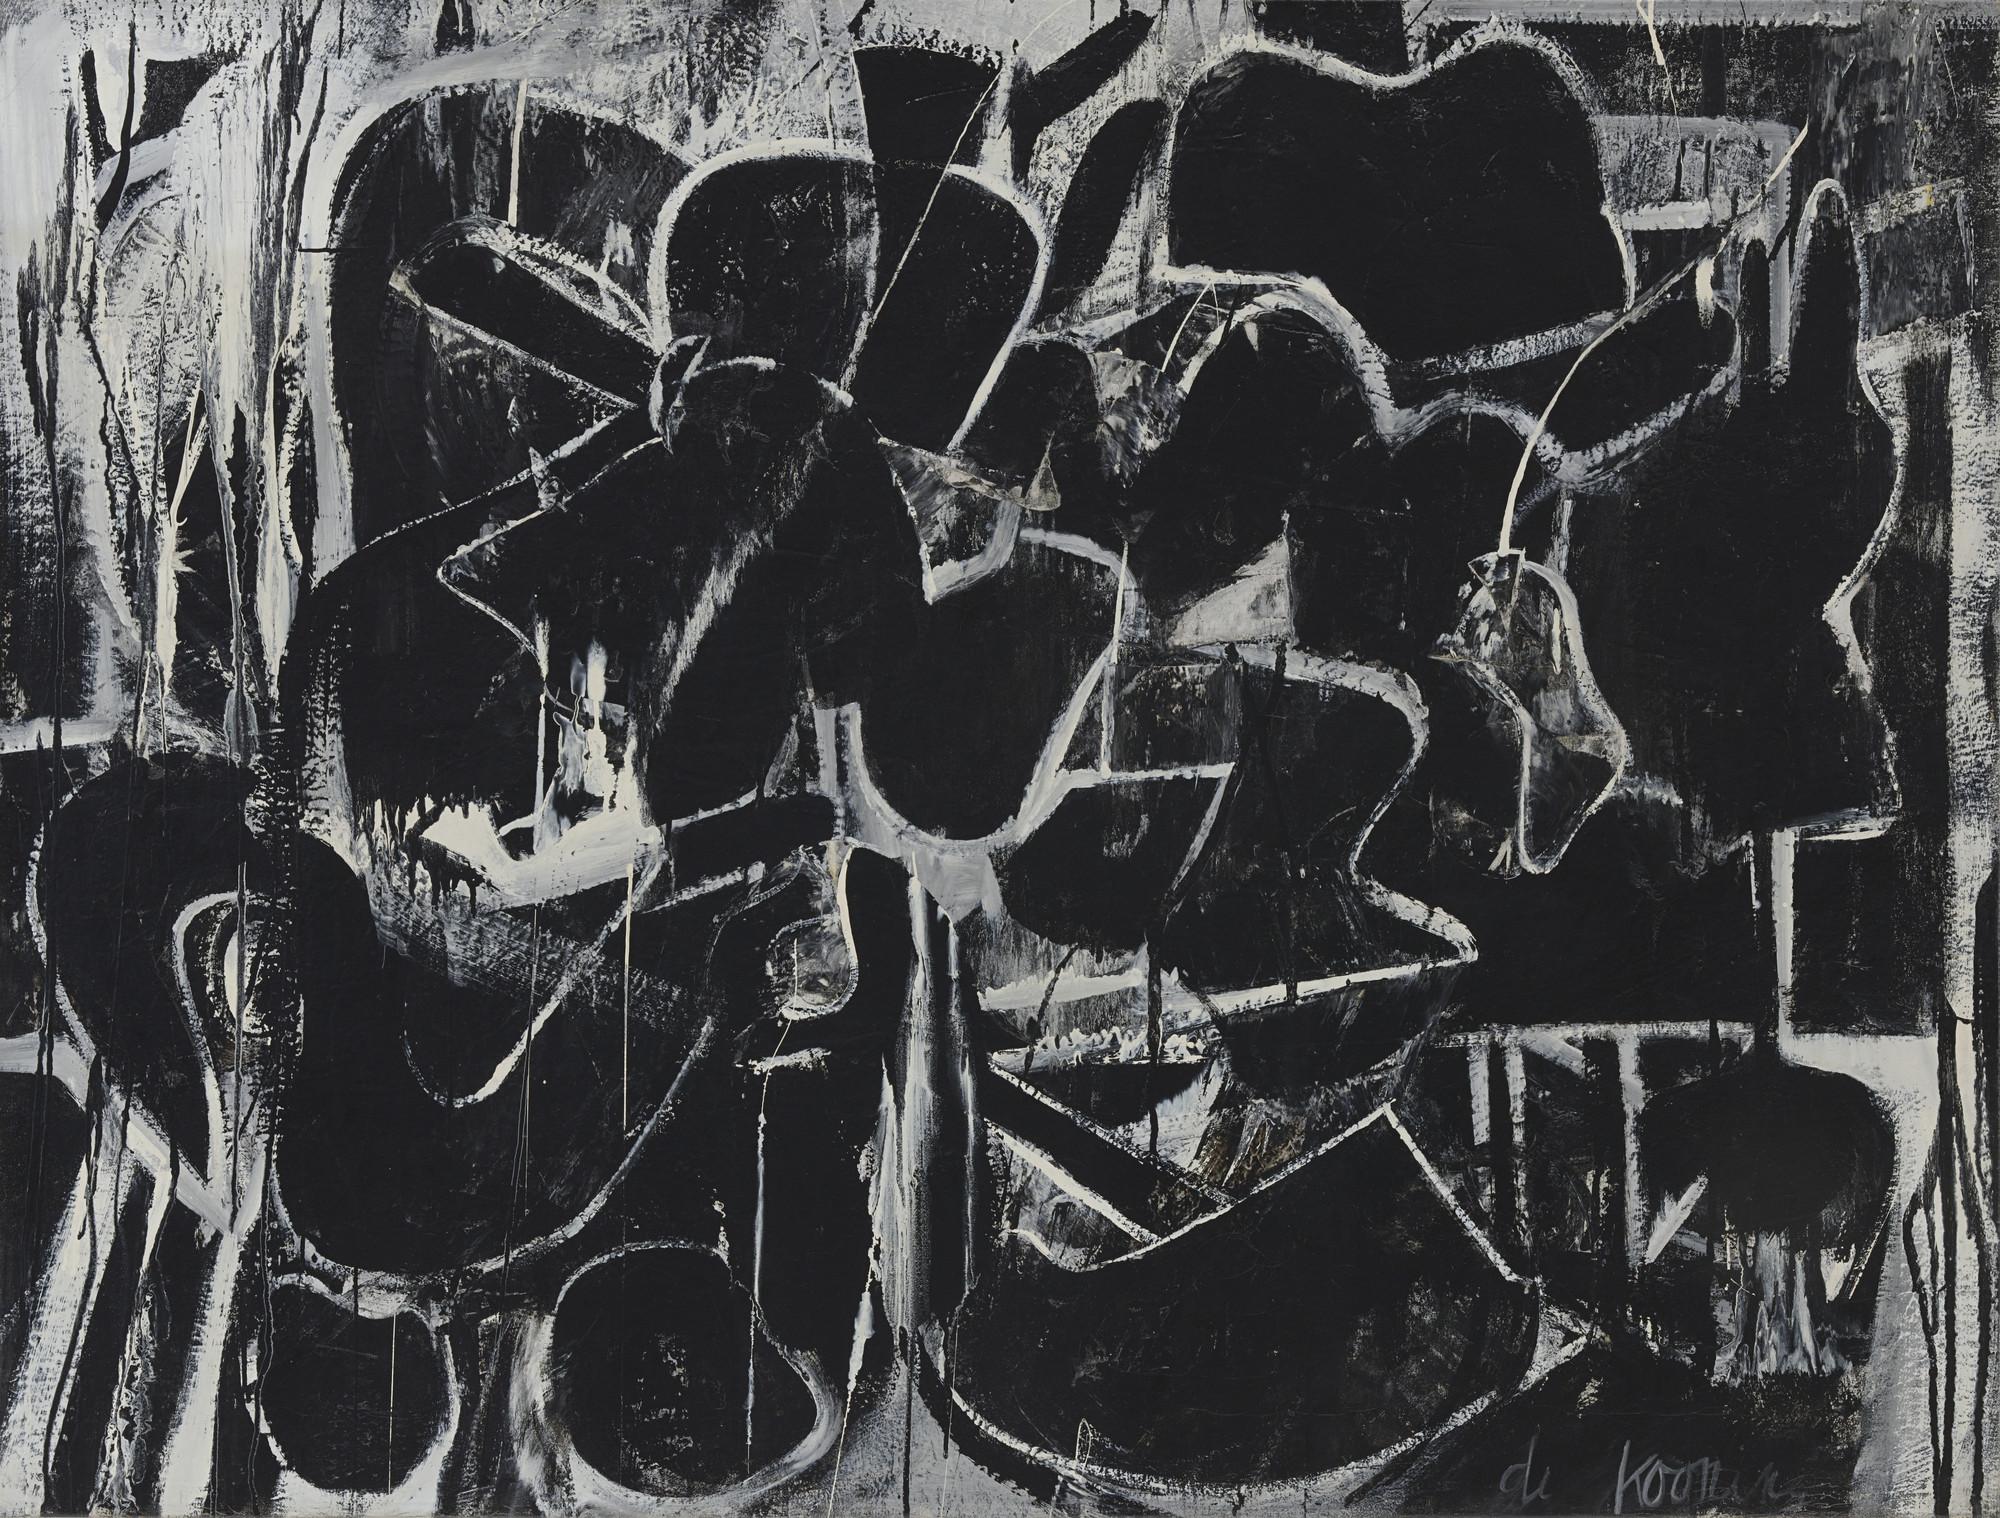 Willem de Kooning Painting 1948